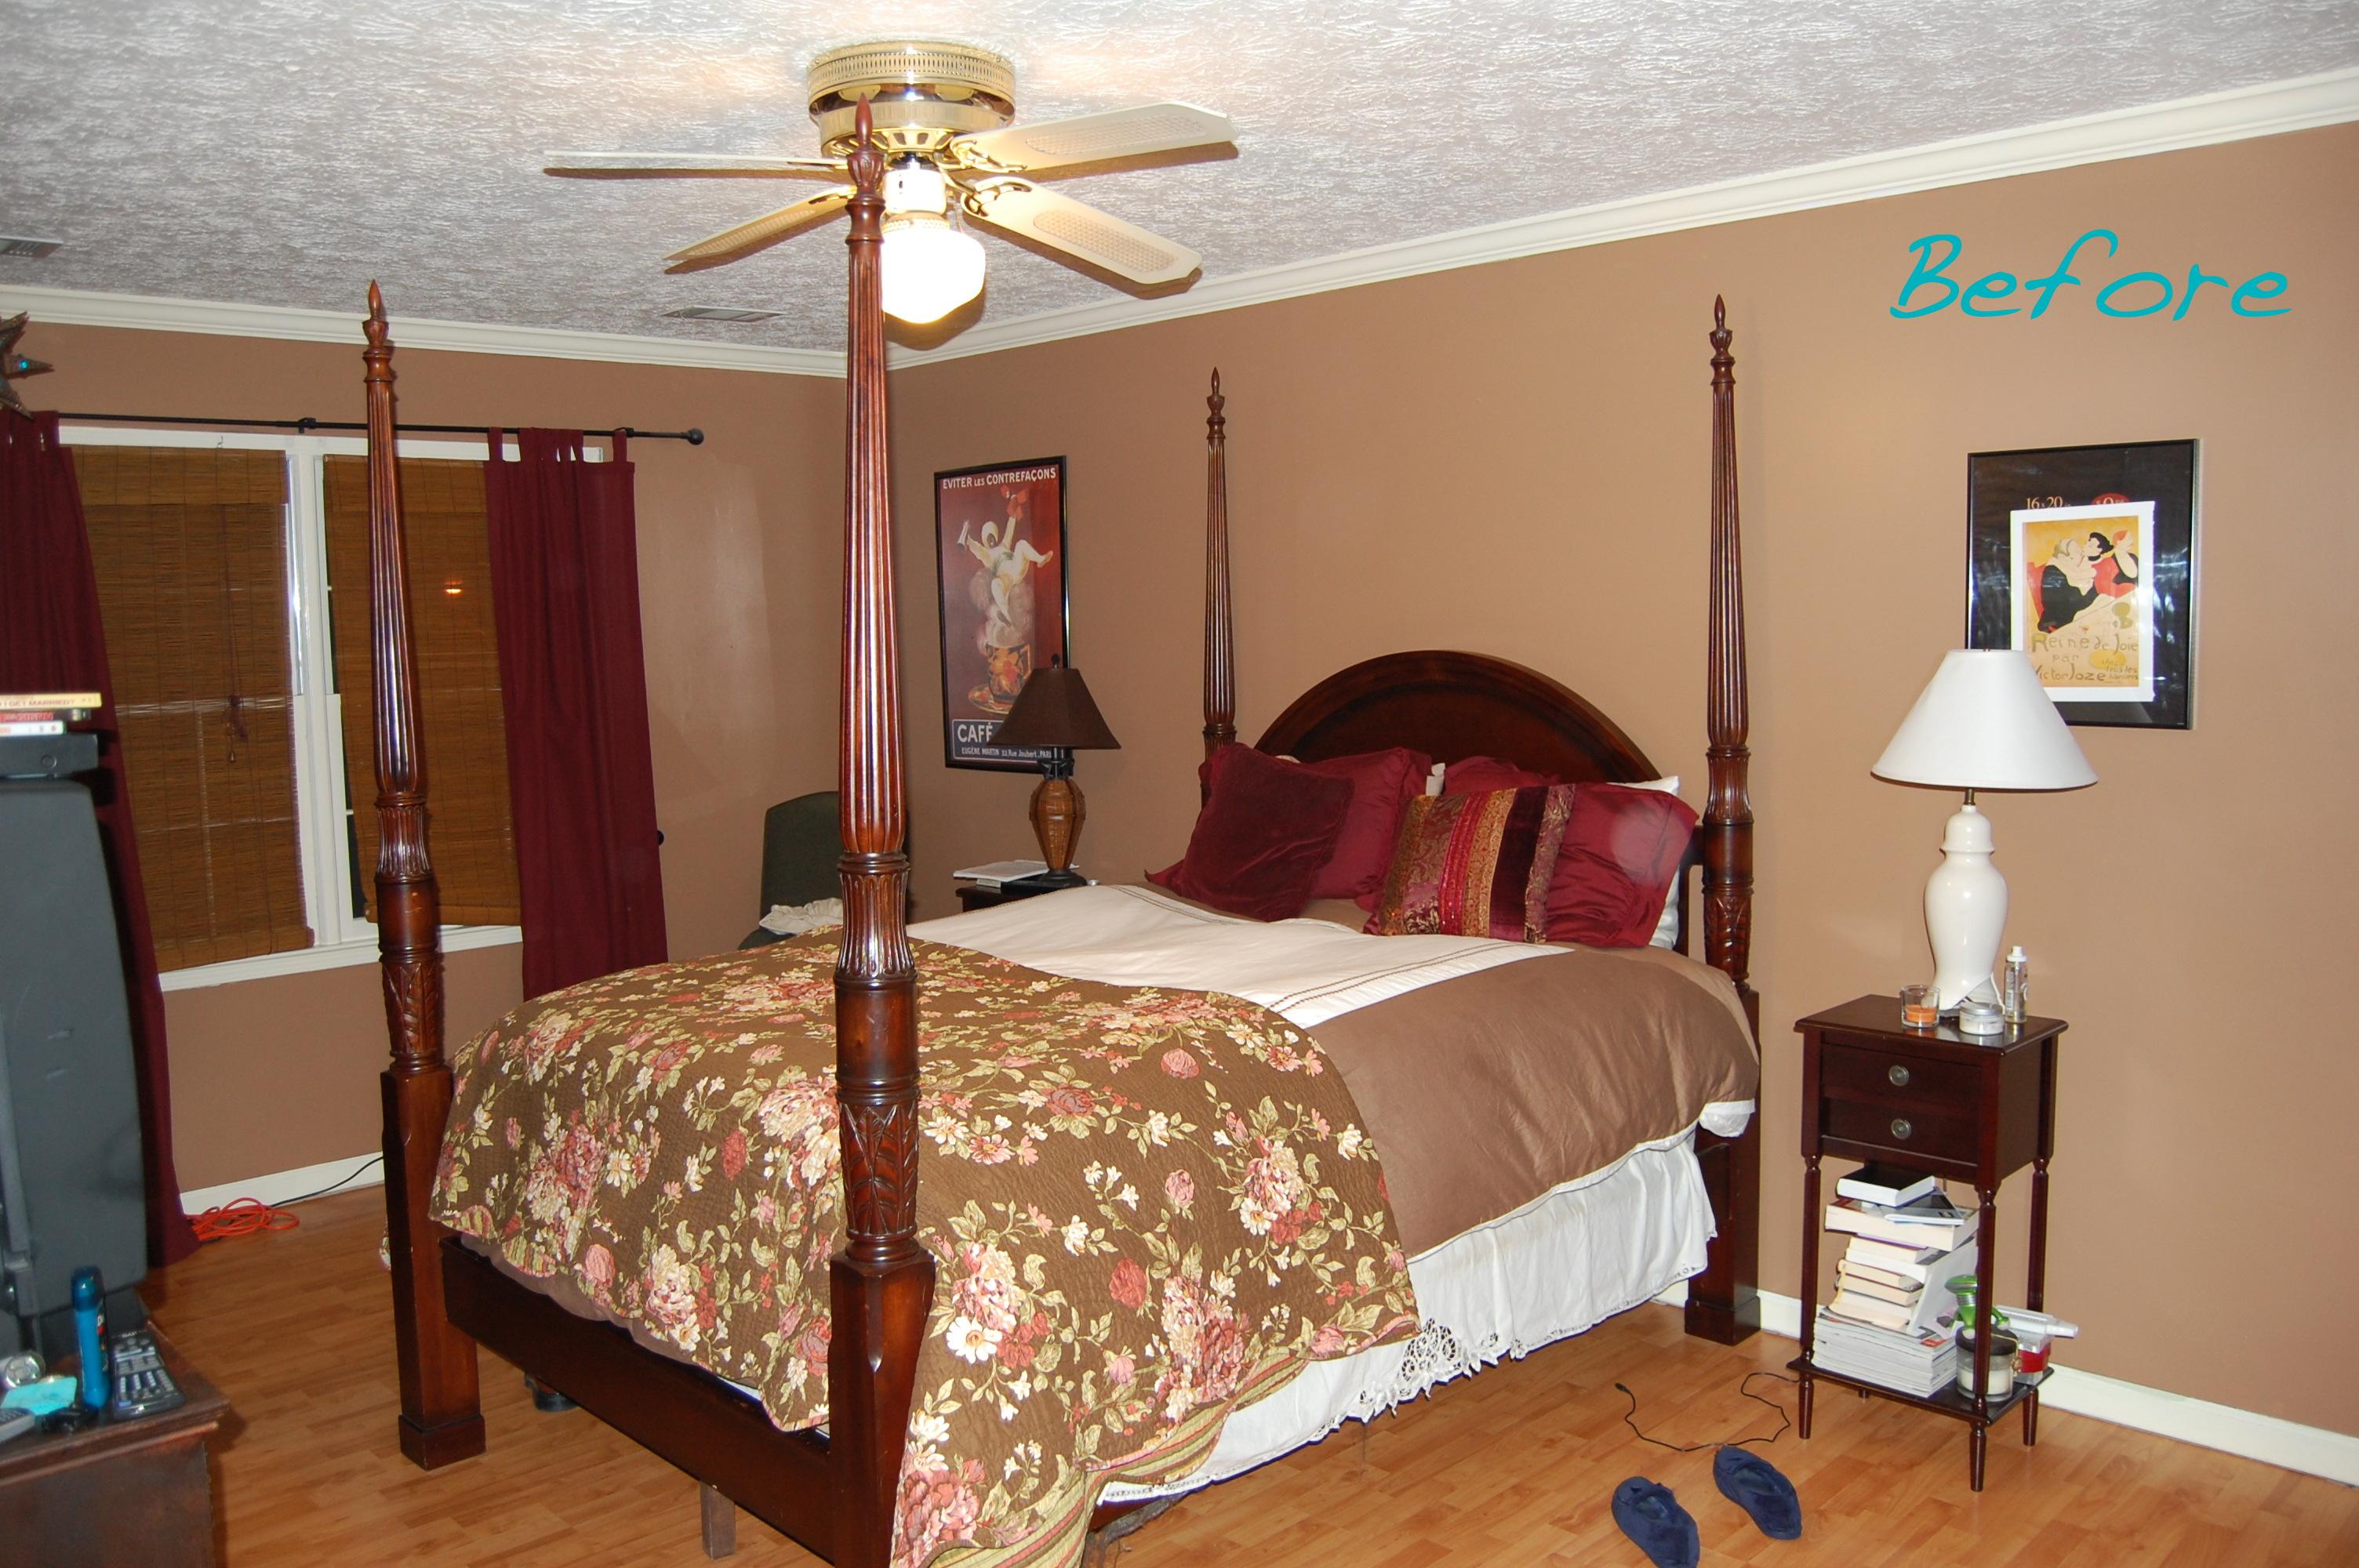 Bedroom before for Four room set design